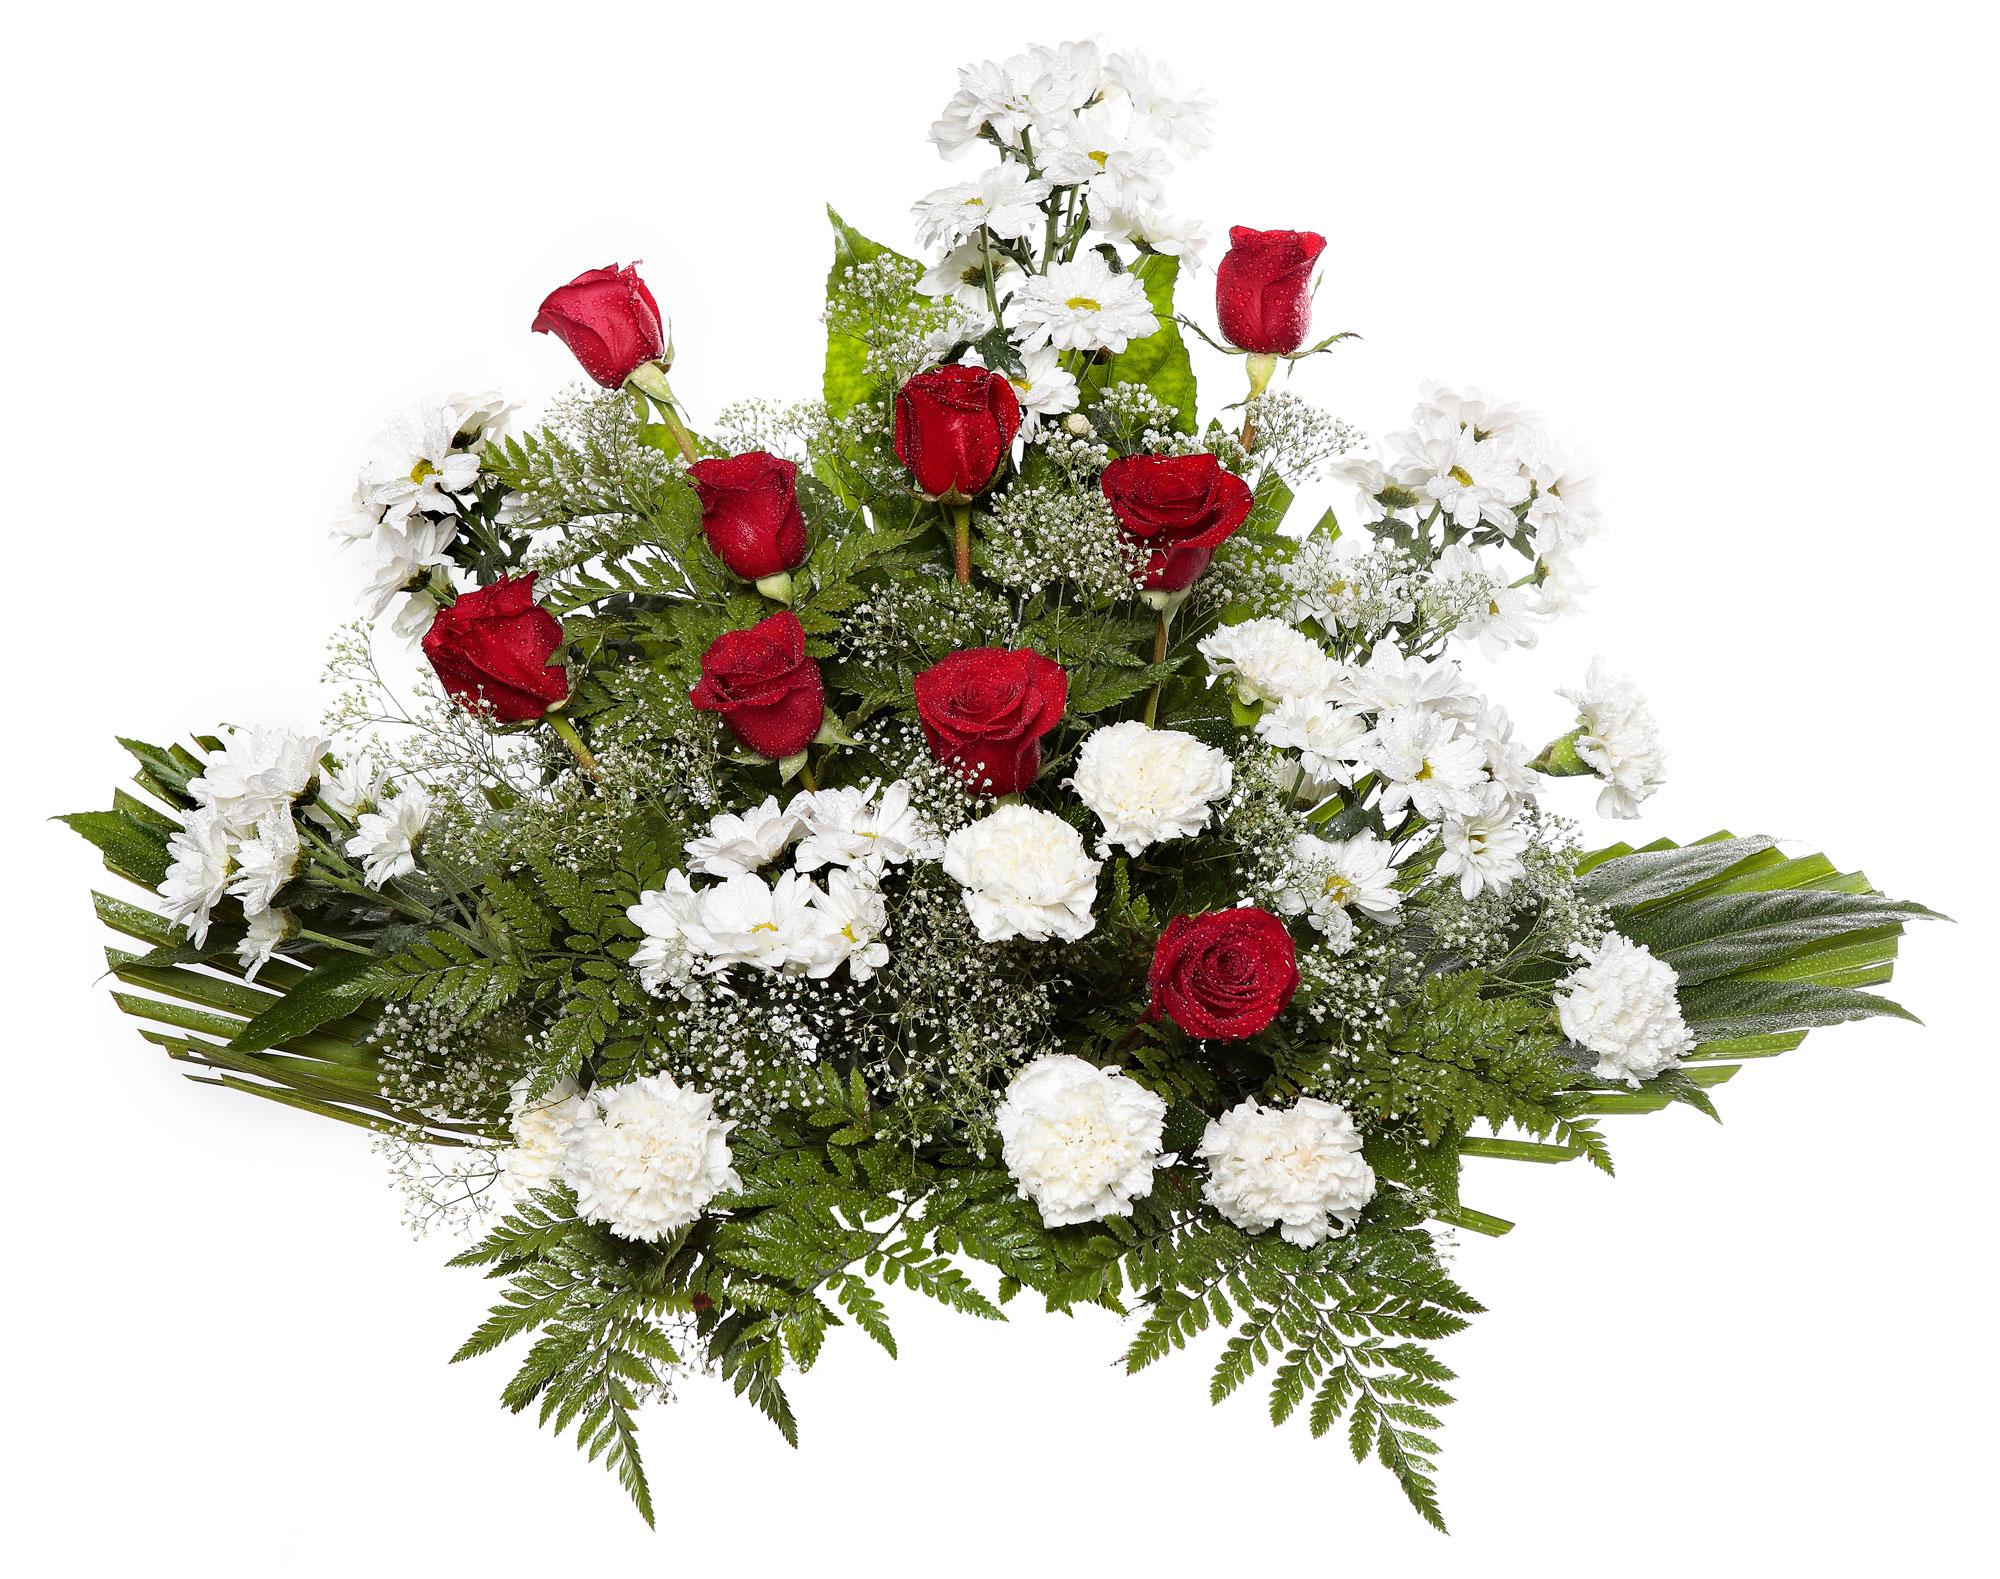 Centro tanatorio 1 detalles flores naturales tienda - Centros de flores naturales ...